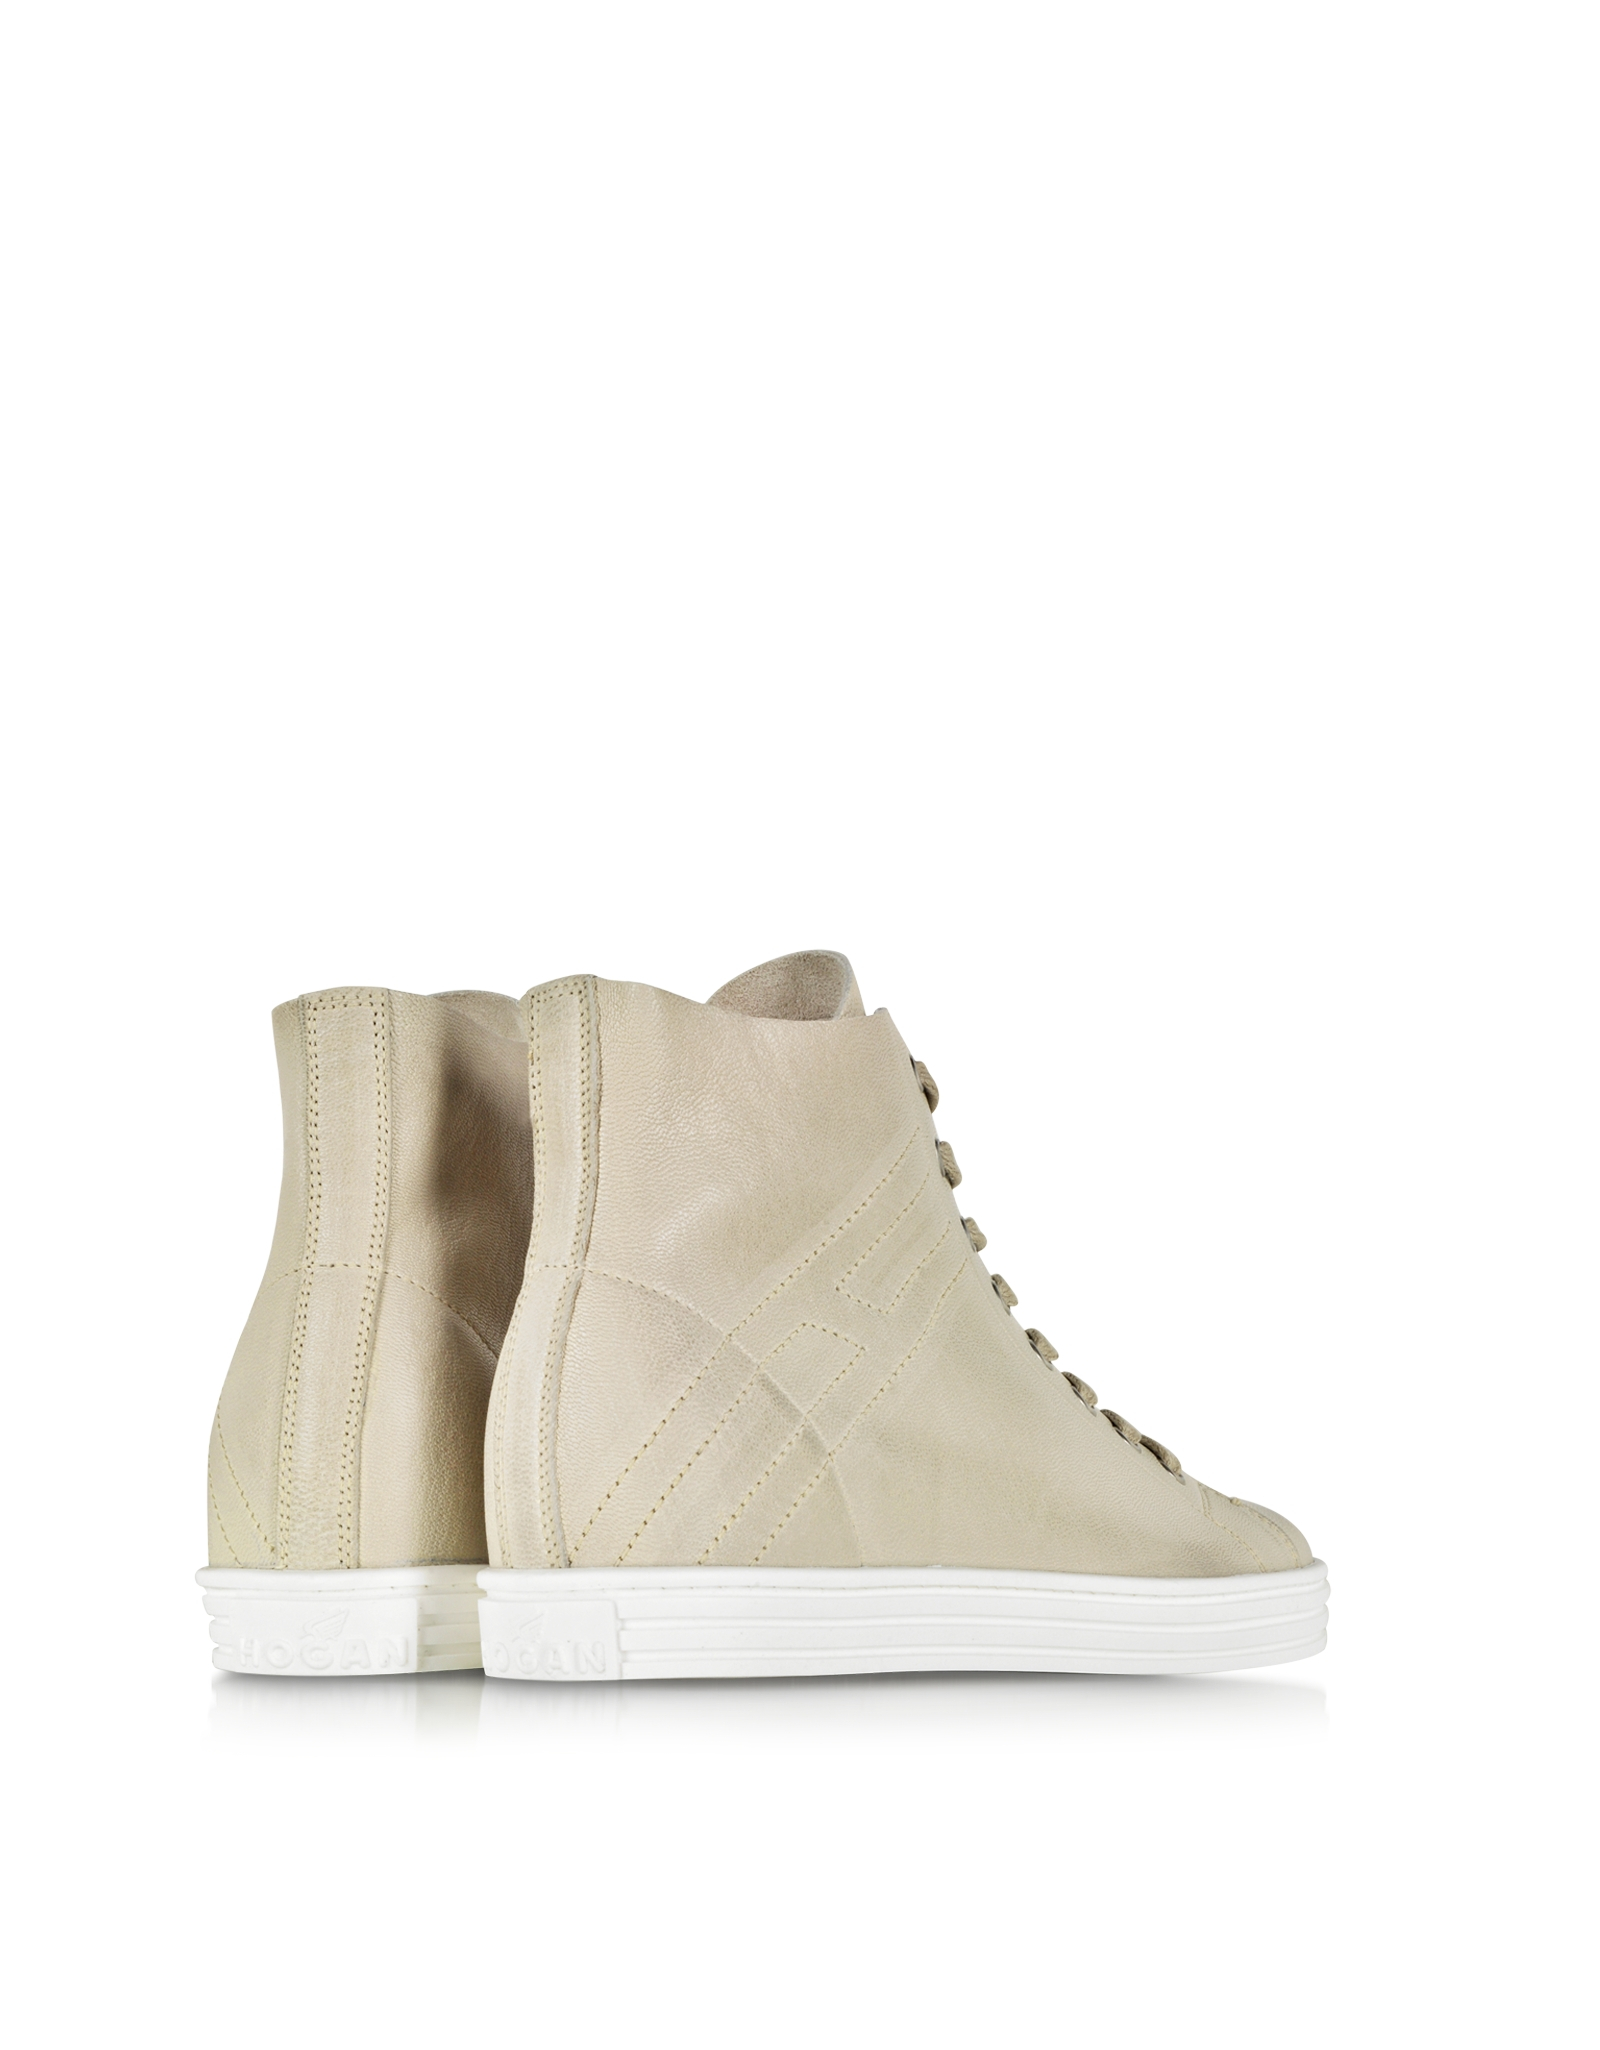 Lyst - Hogan Rebel Stressed White Leather High Top Women S Sneaker ... d899dfbd3ca